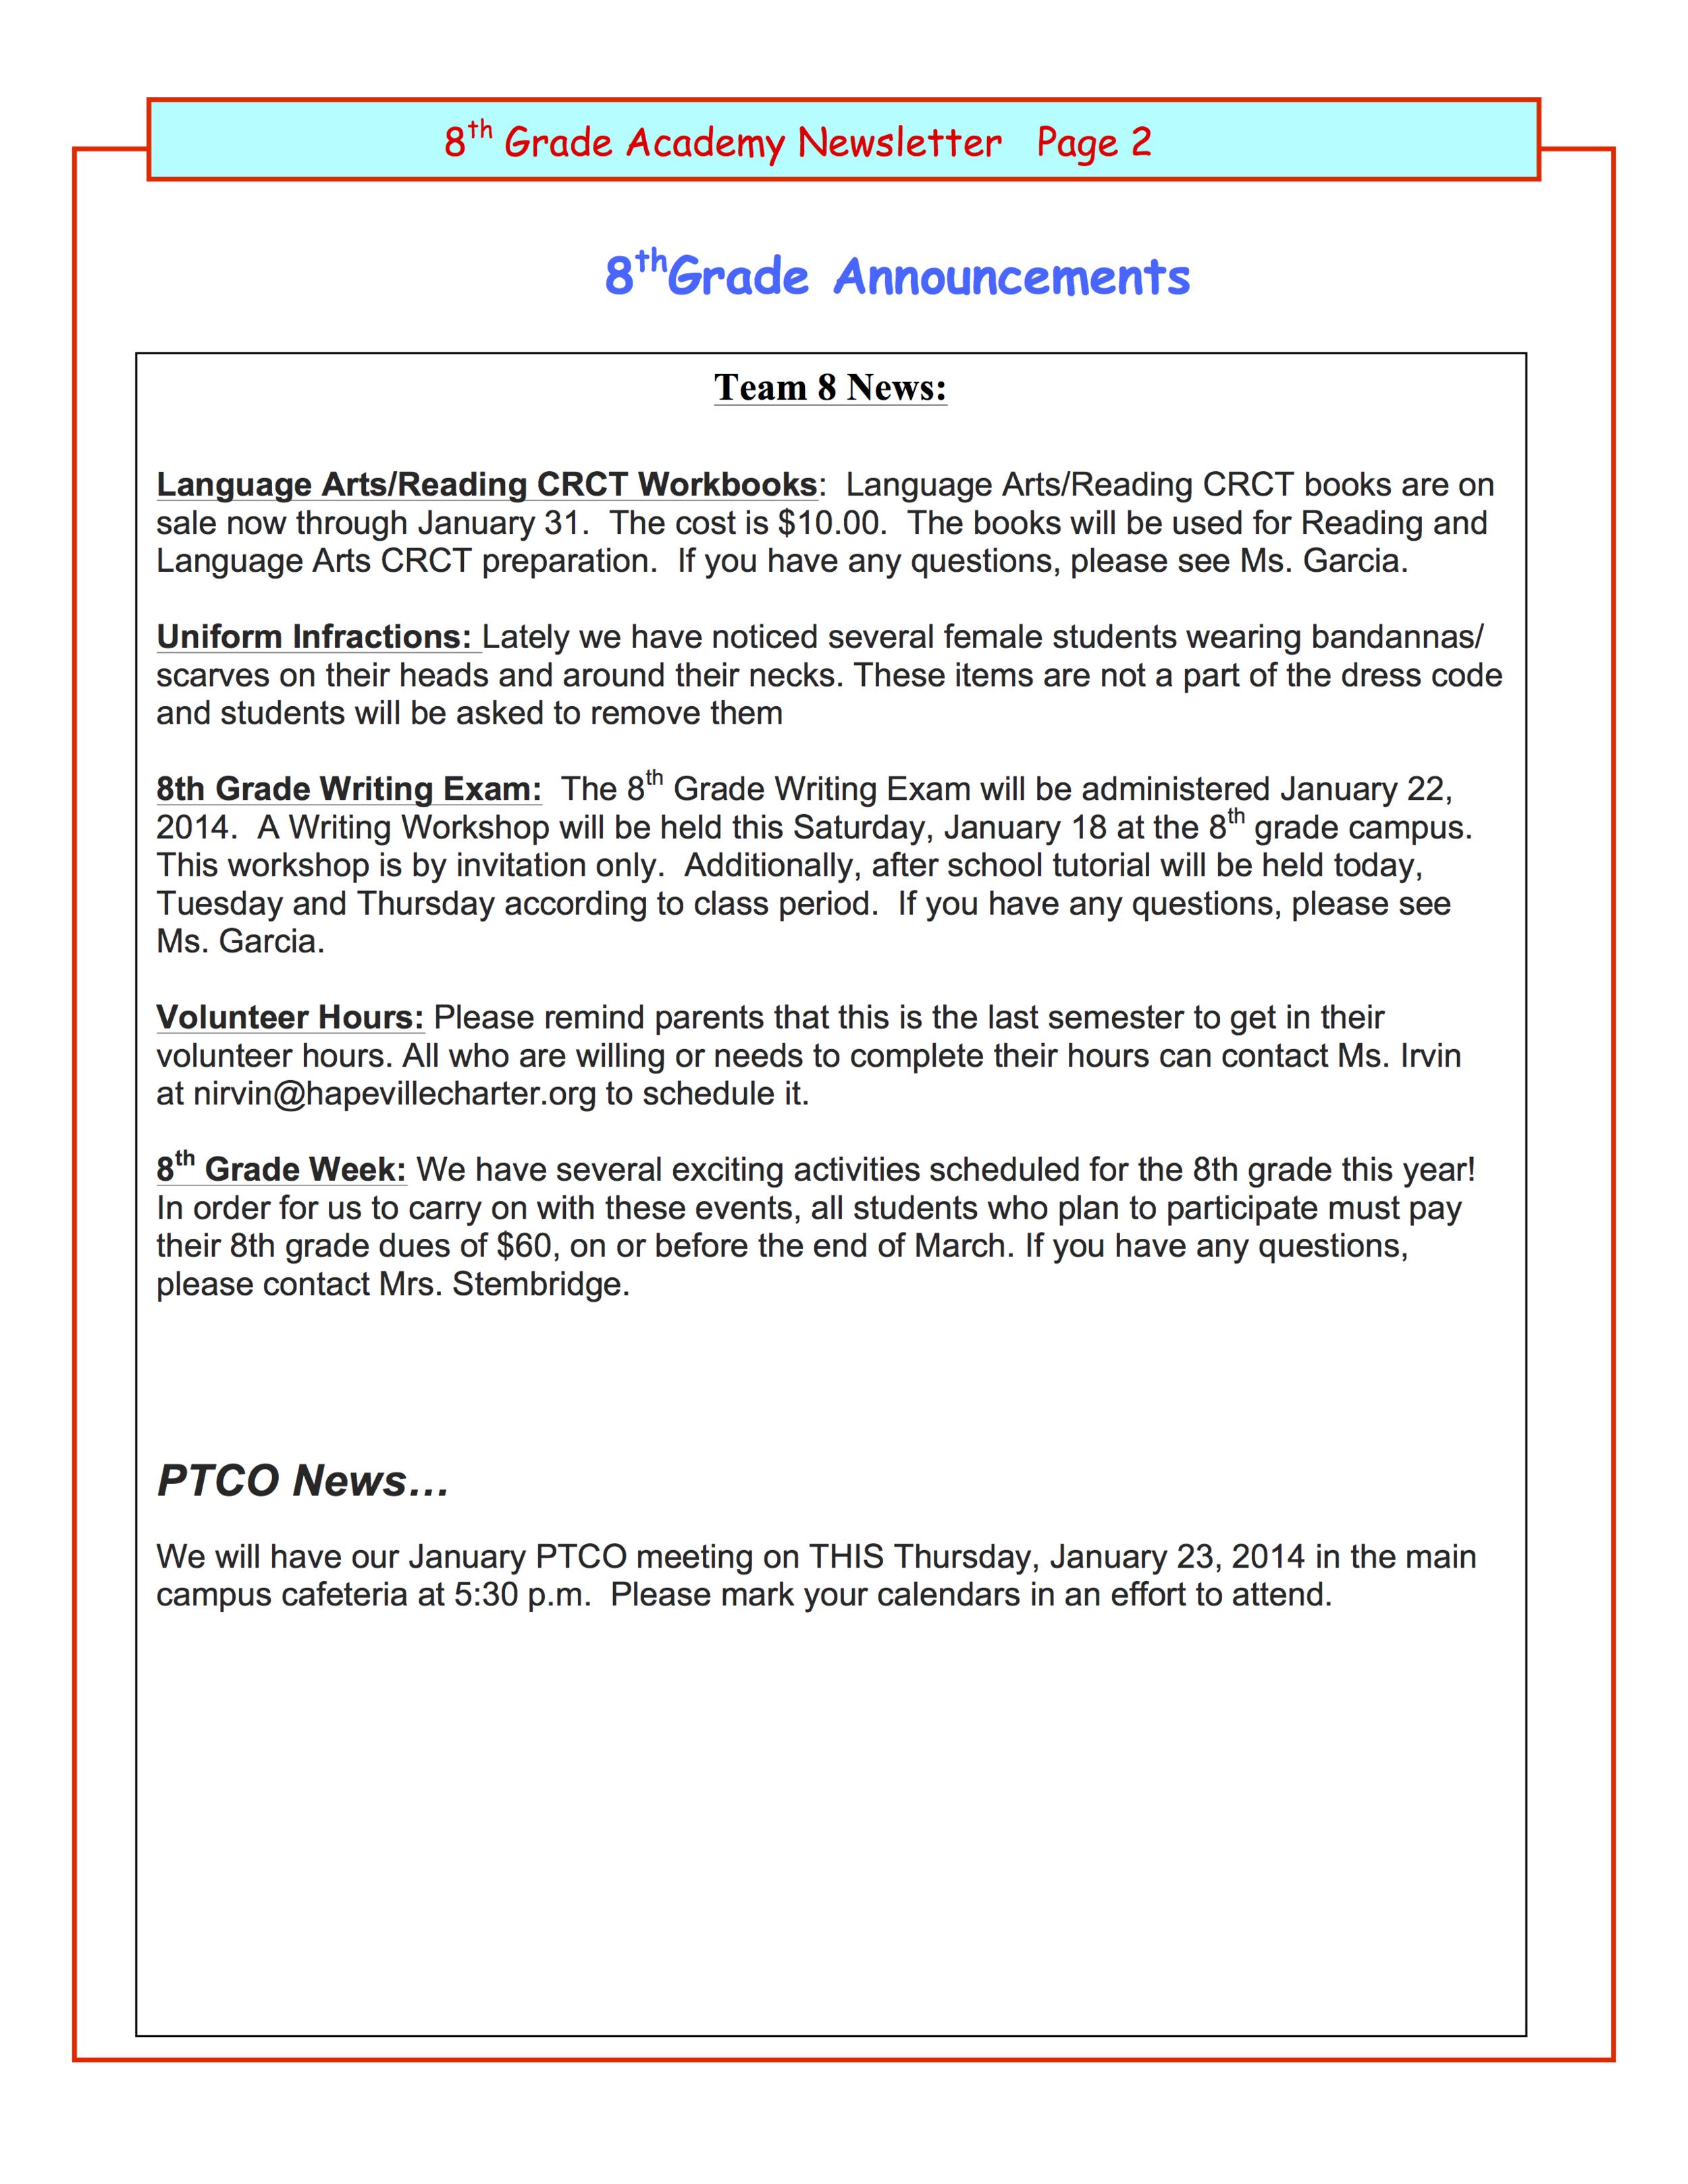 8th grade newsletter 1-21B.png